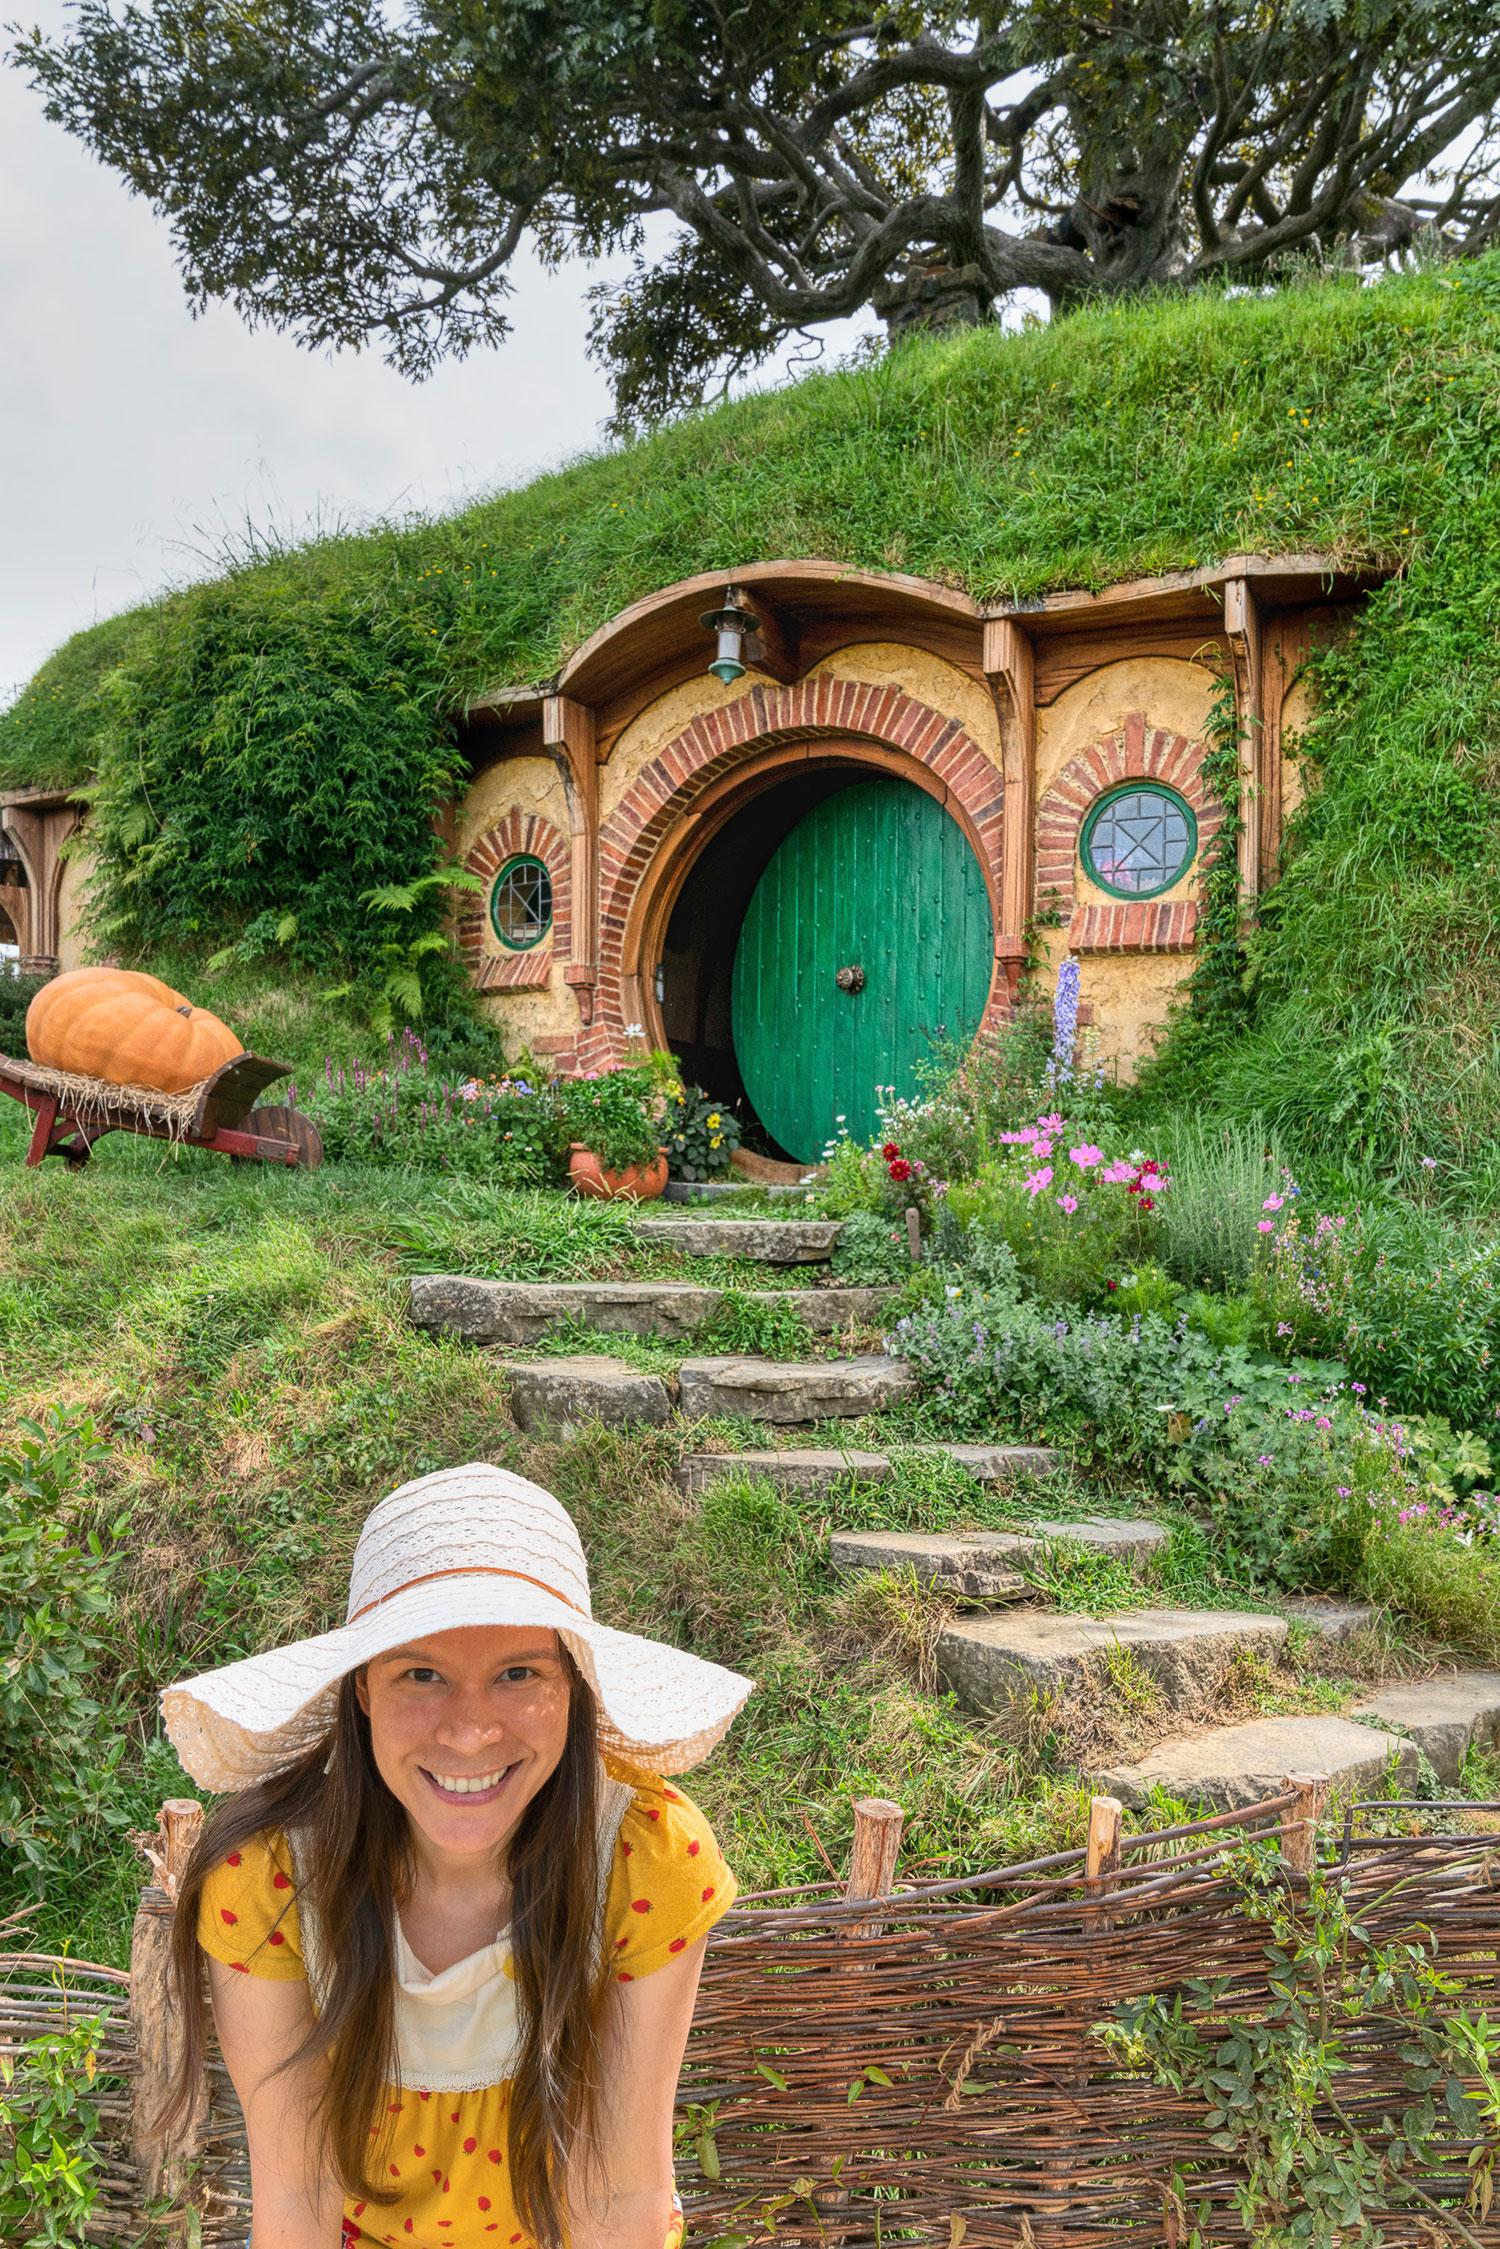 Thaneeya McArdle in front of a Hobbit home in Hobbiton, Matamata, New Zealand